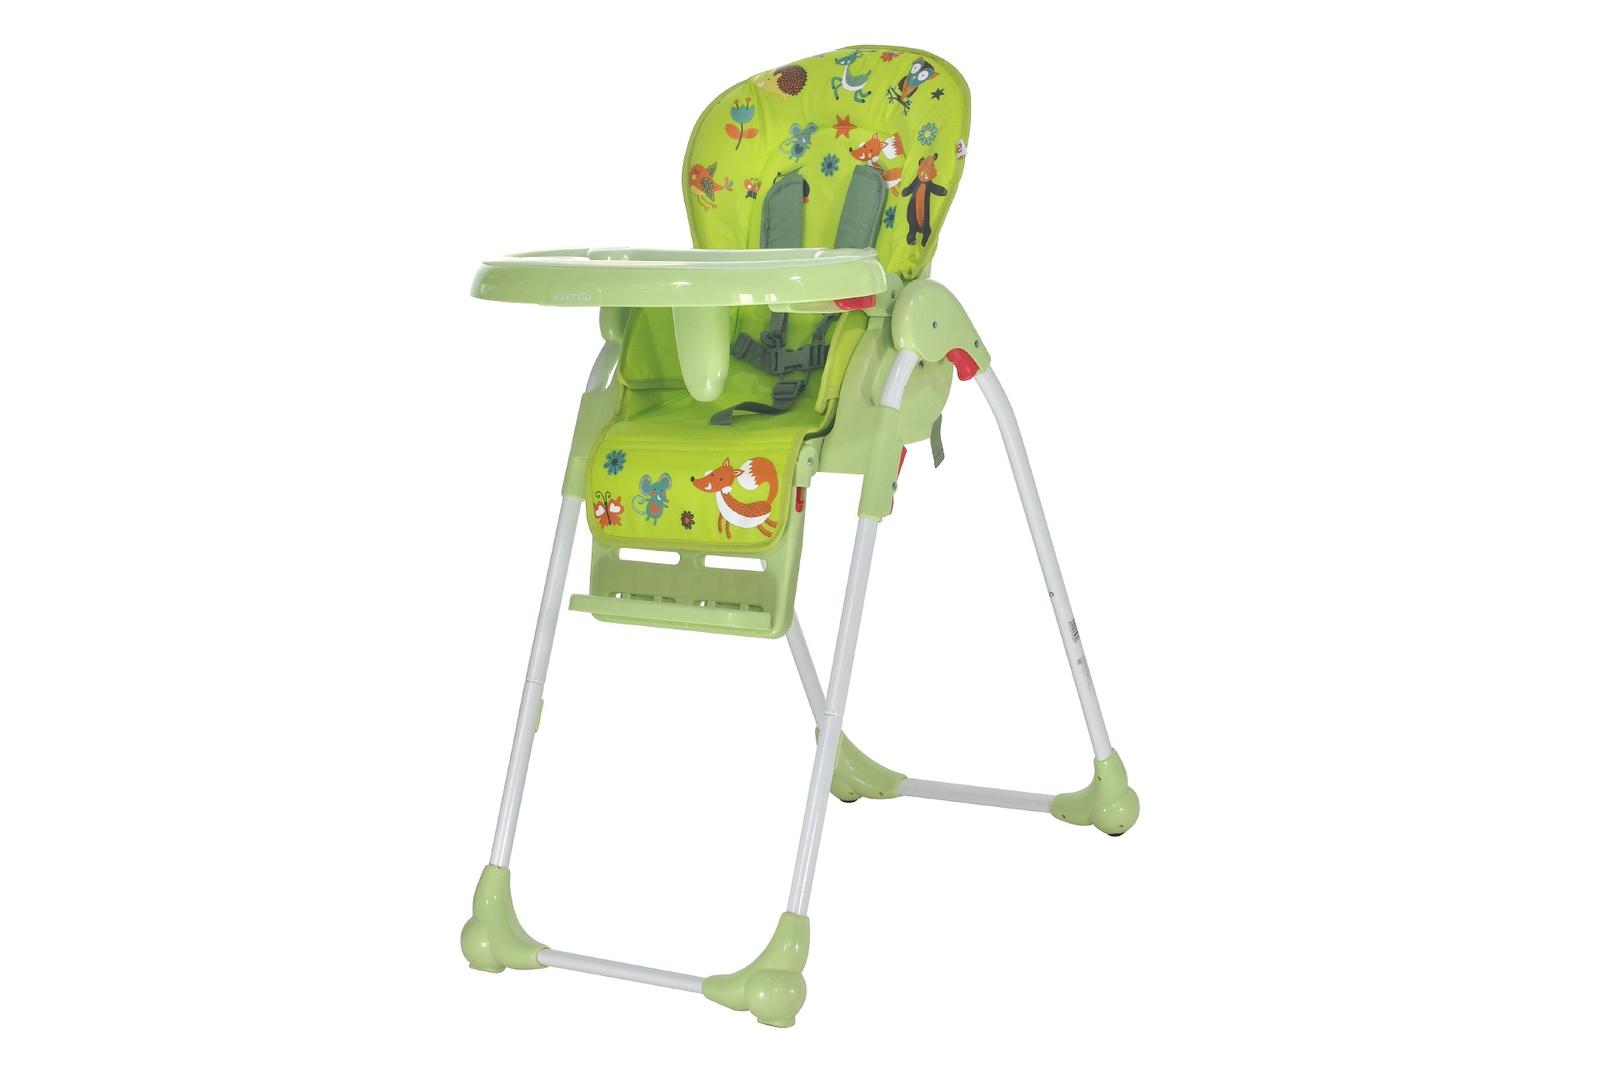 Стульчик для кормления Everflo Forest Green (Q35) стул everflo gently provence q55